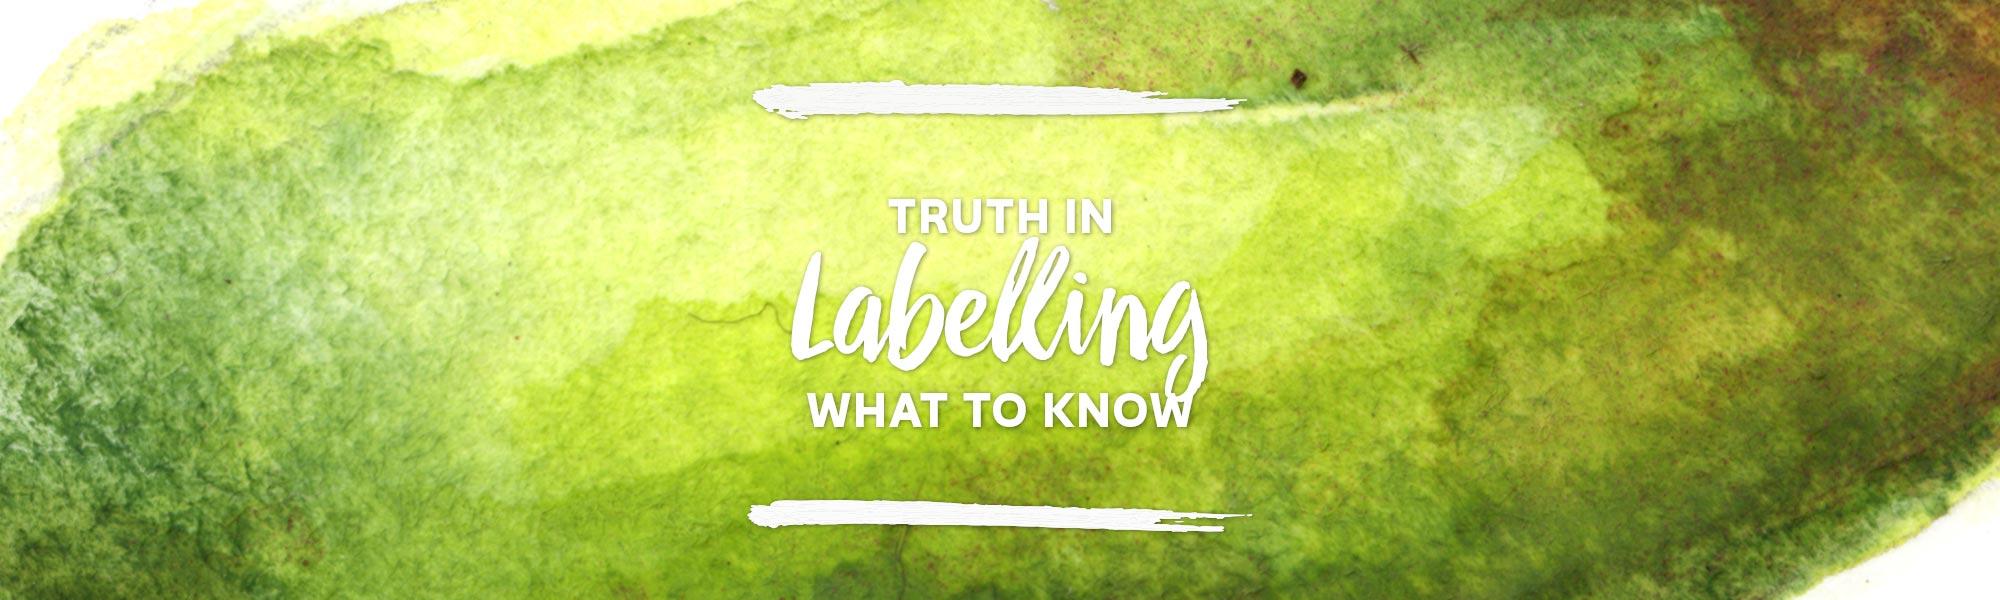 Wild-Botanicals-Truth-in-Labeling-Blog.jpg